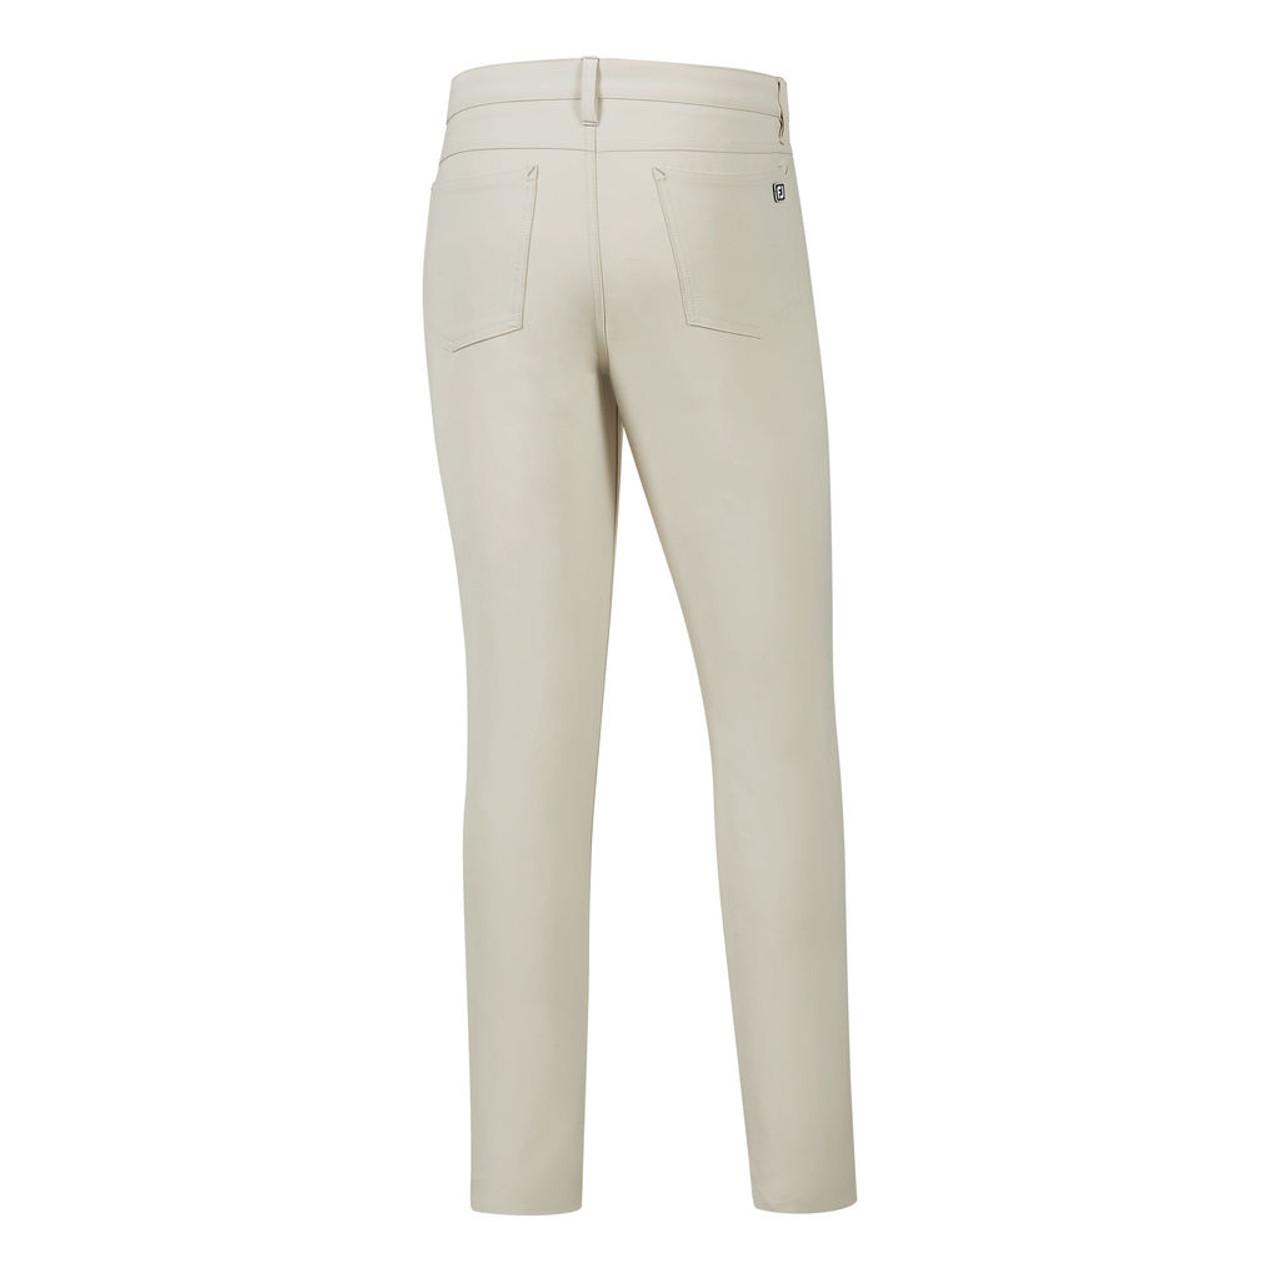 FootJoy Athletic Fit Performance 5-Pocket Pants - Stone (24478)